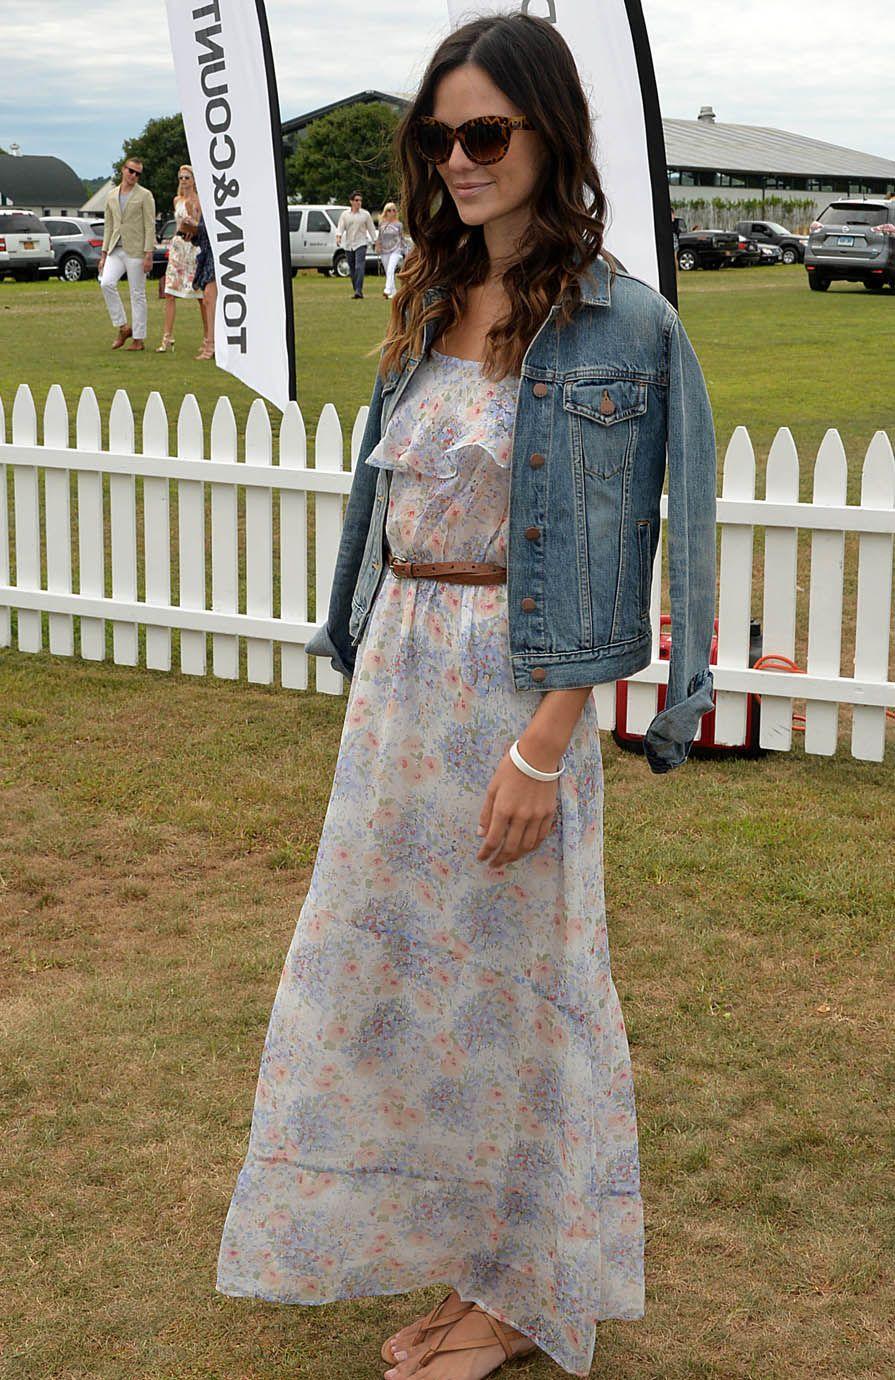 2b43b8eb121e Polo Match Dresscode - Polo Match Fashion - Town   Country Magazine